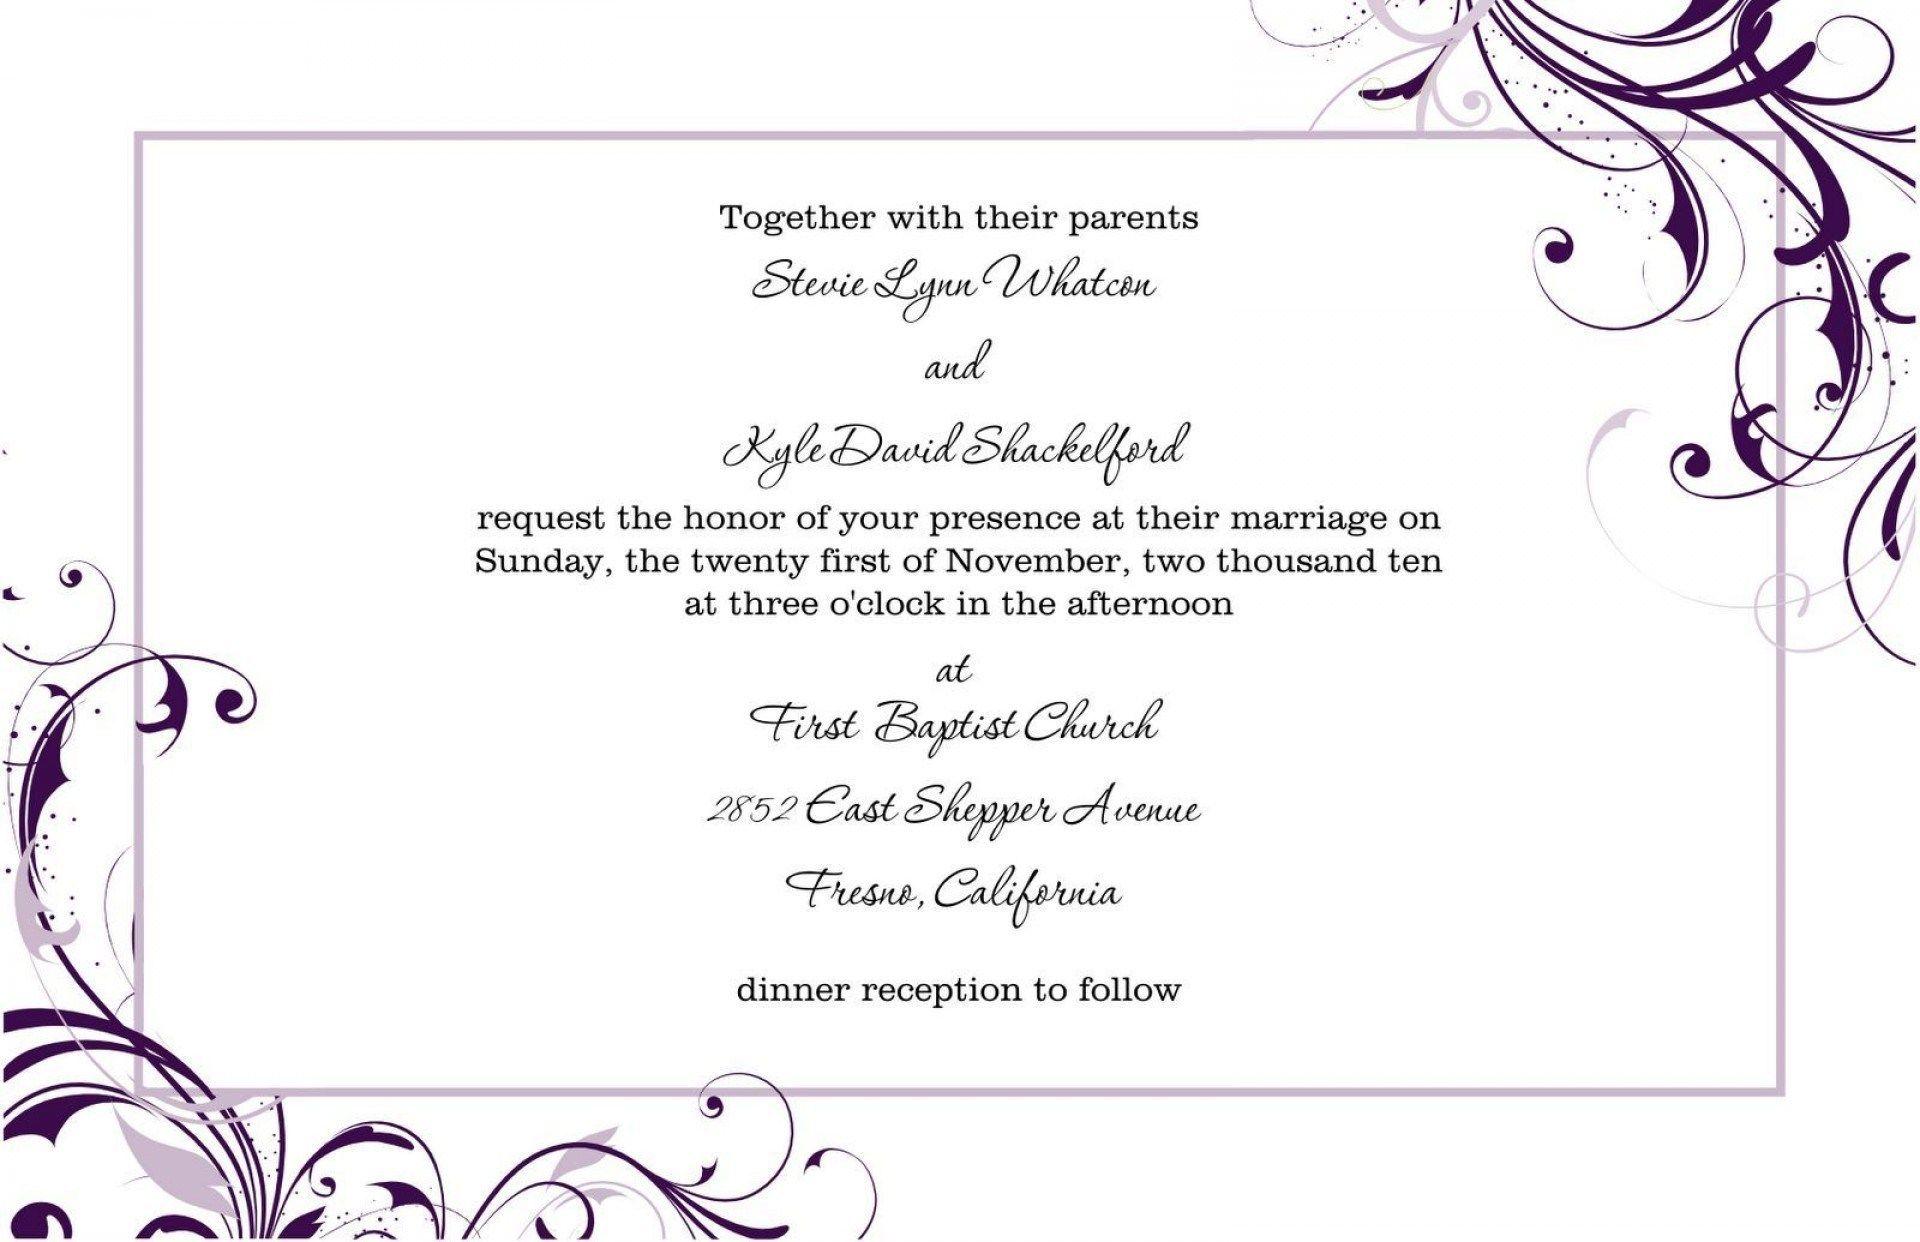 35 Great Image Of Free Wedding Invitation Templates For Word Regiosfera Com Free Wedding Invitation Templates Blank Wedding Invitation Templates Free Wedding Invitations